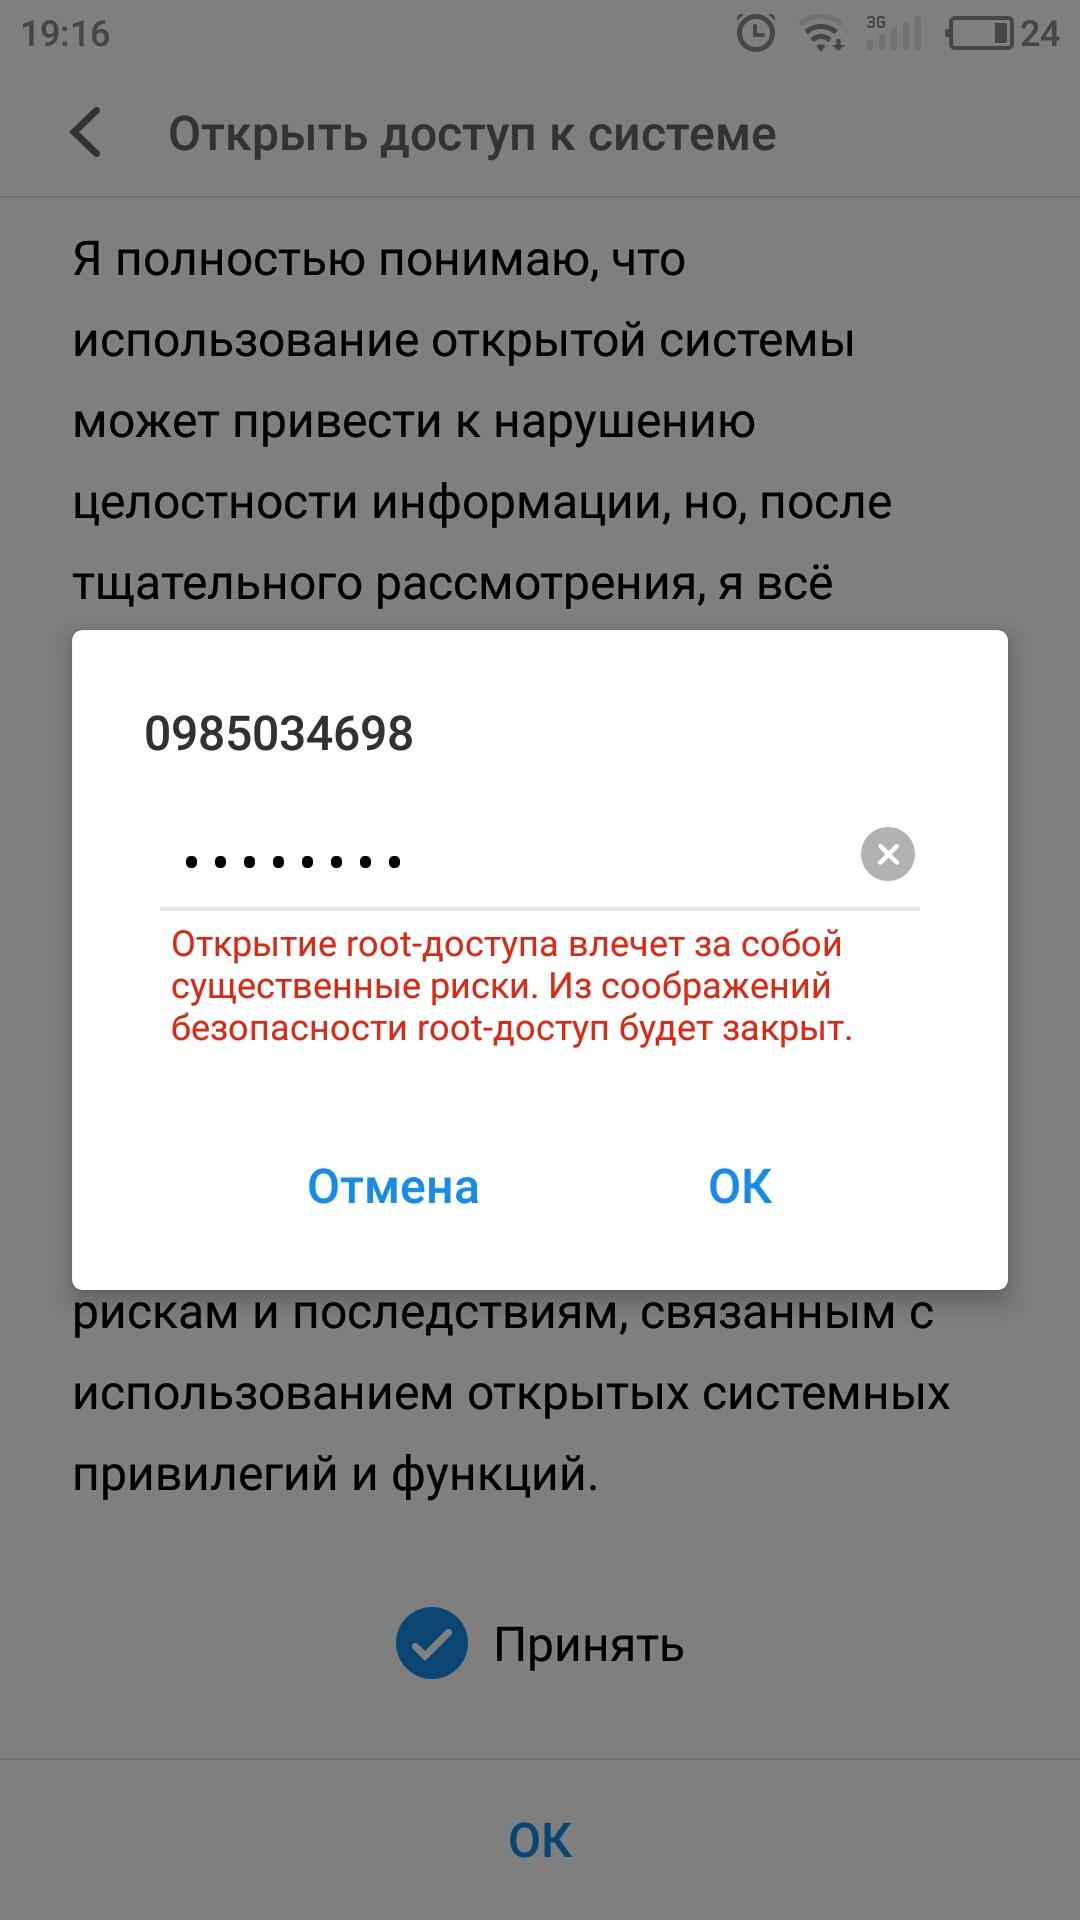 S71113-19161480.jpg